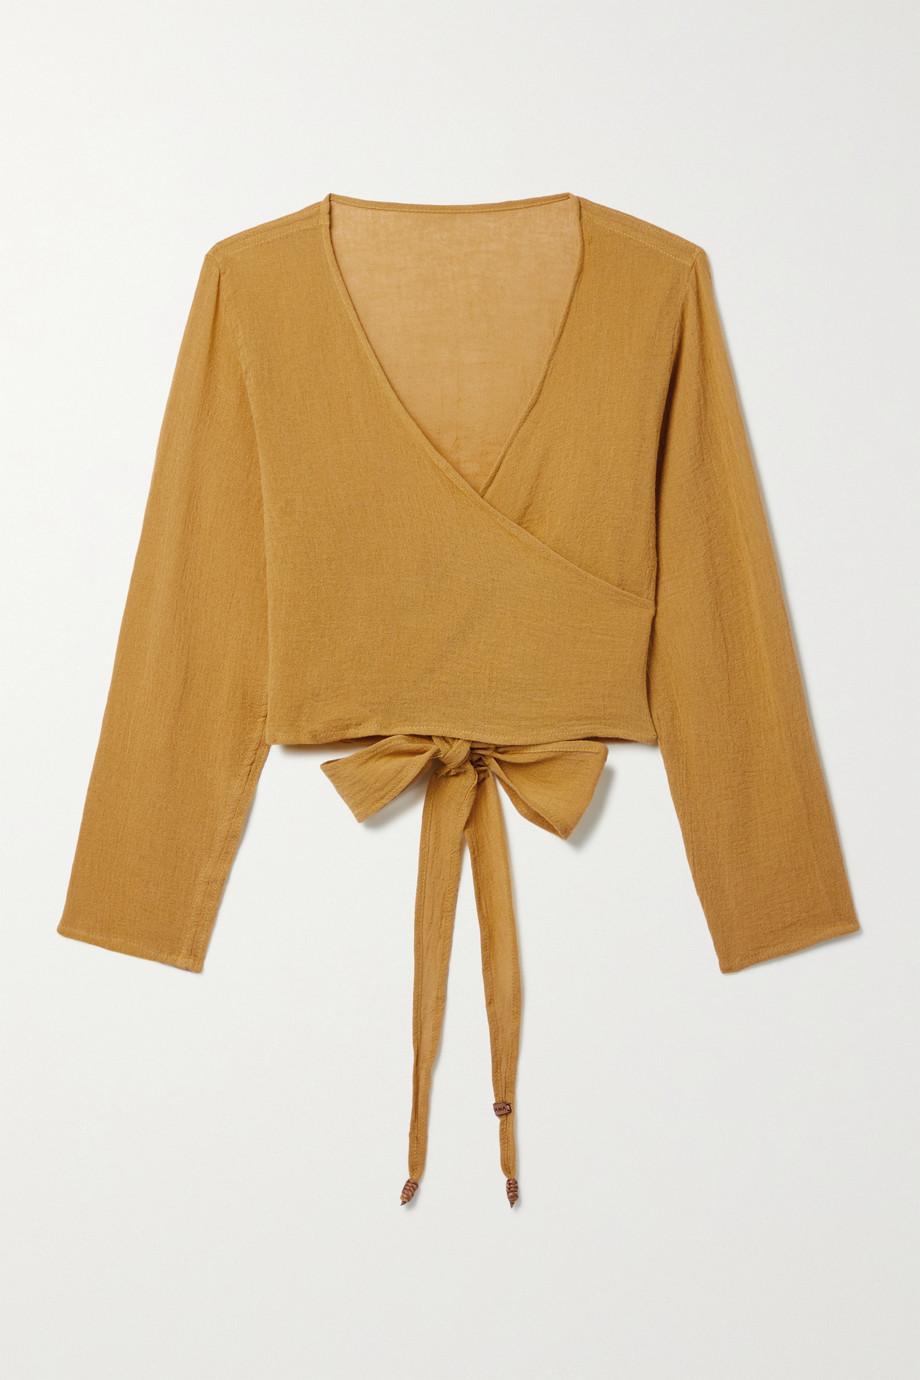 Caravana Lahun cropped cotton-gauze top